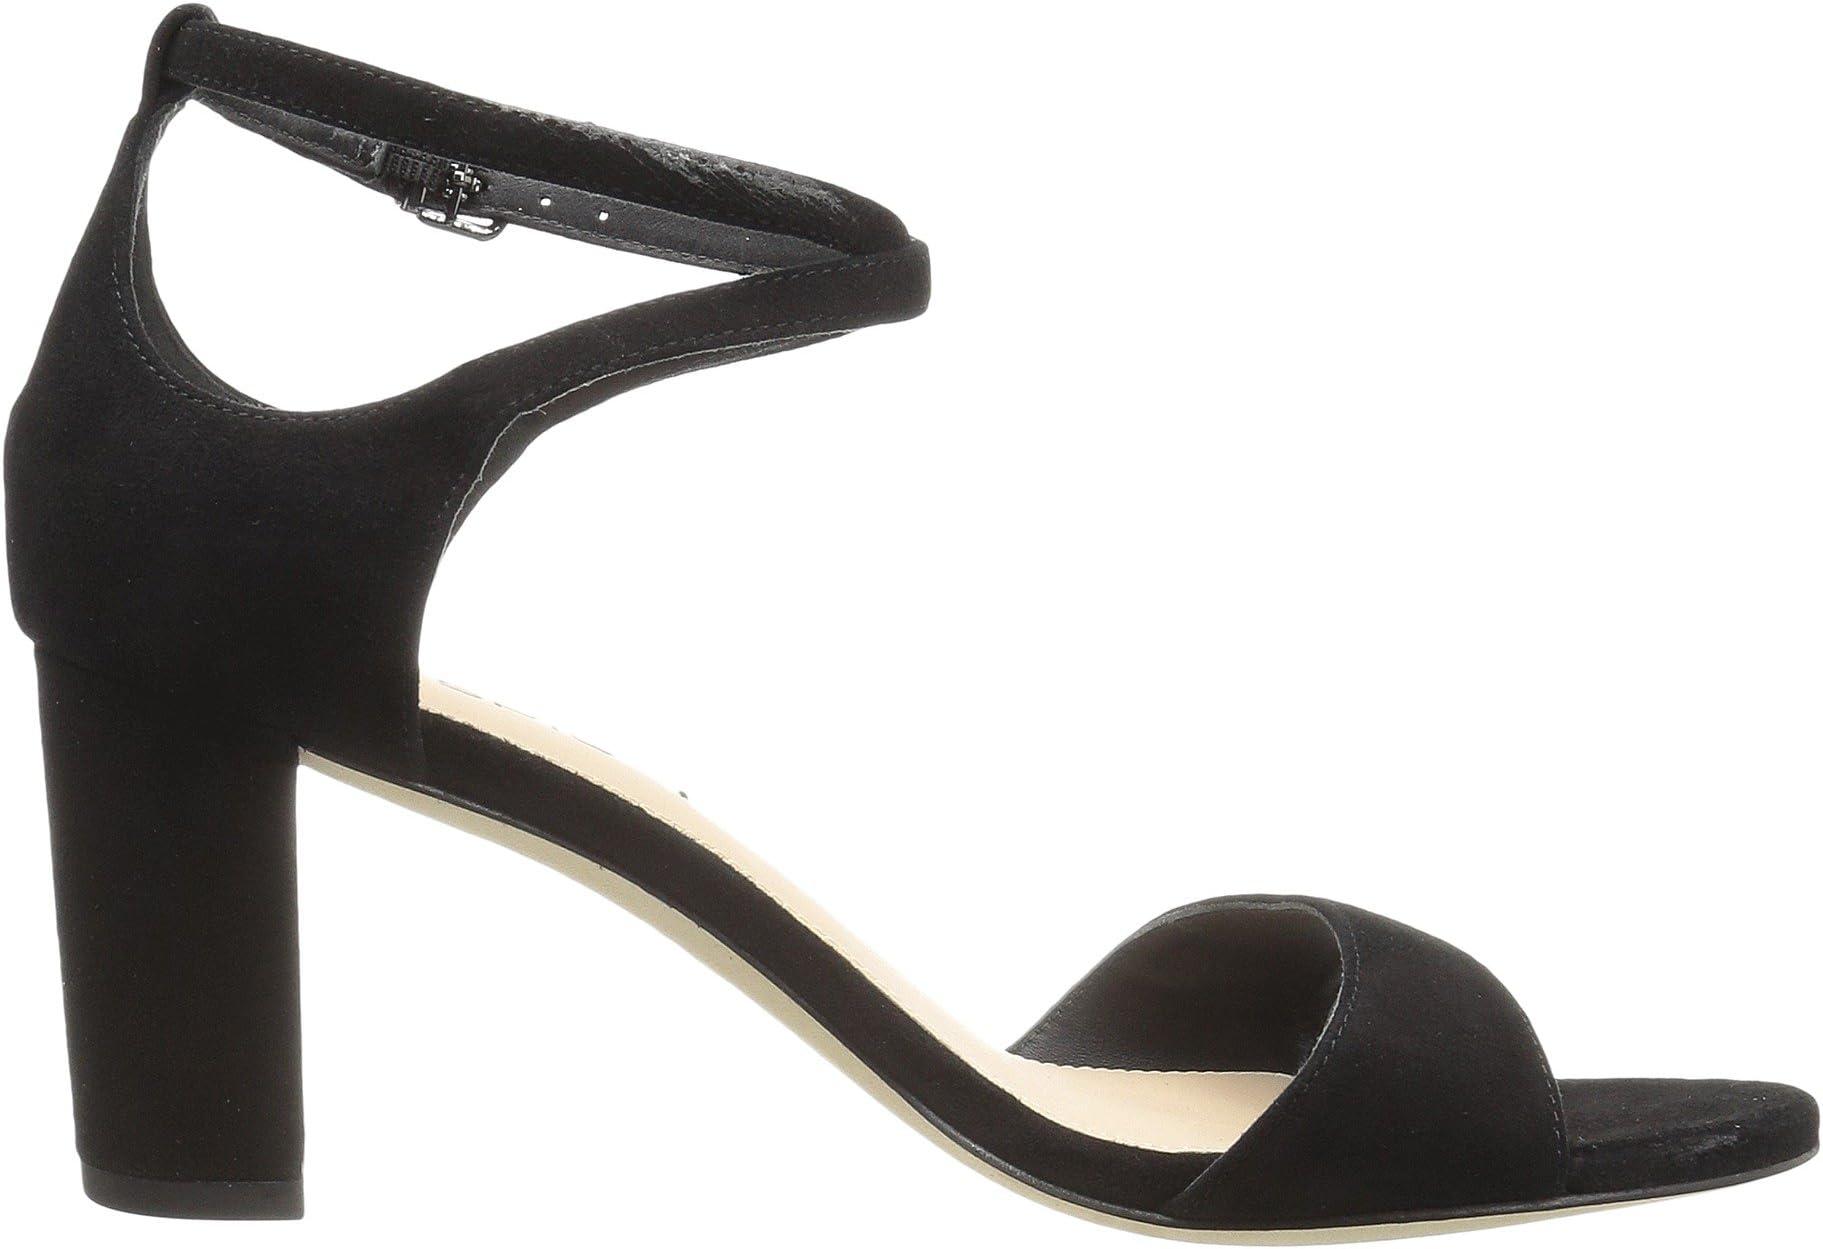 Via Spiga Wendi   Women's shoes   2020 Newest